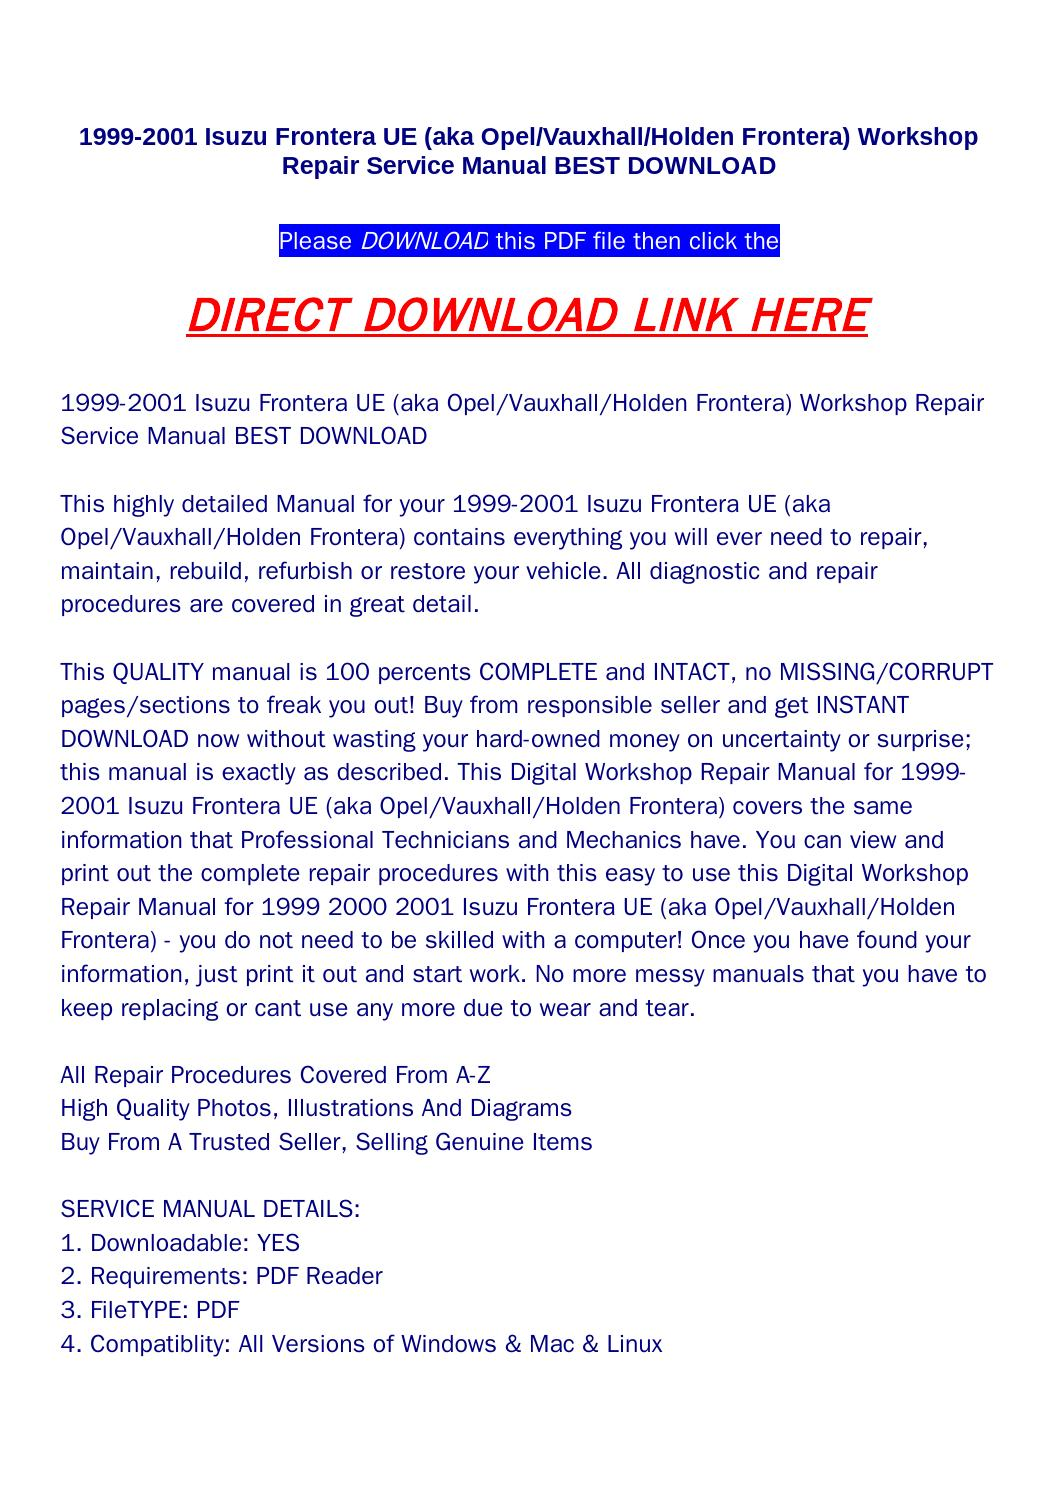 isuzu holden 1999 factory service repair manual ebook